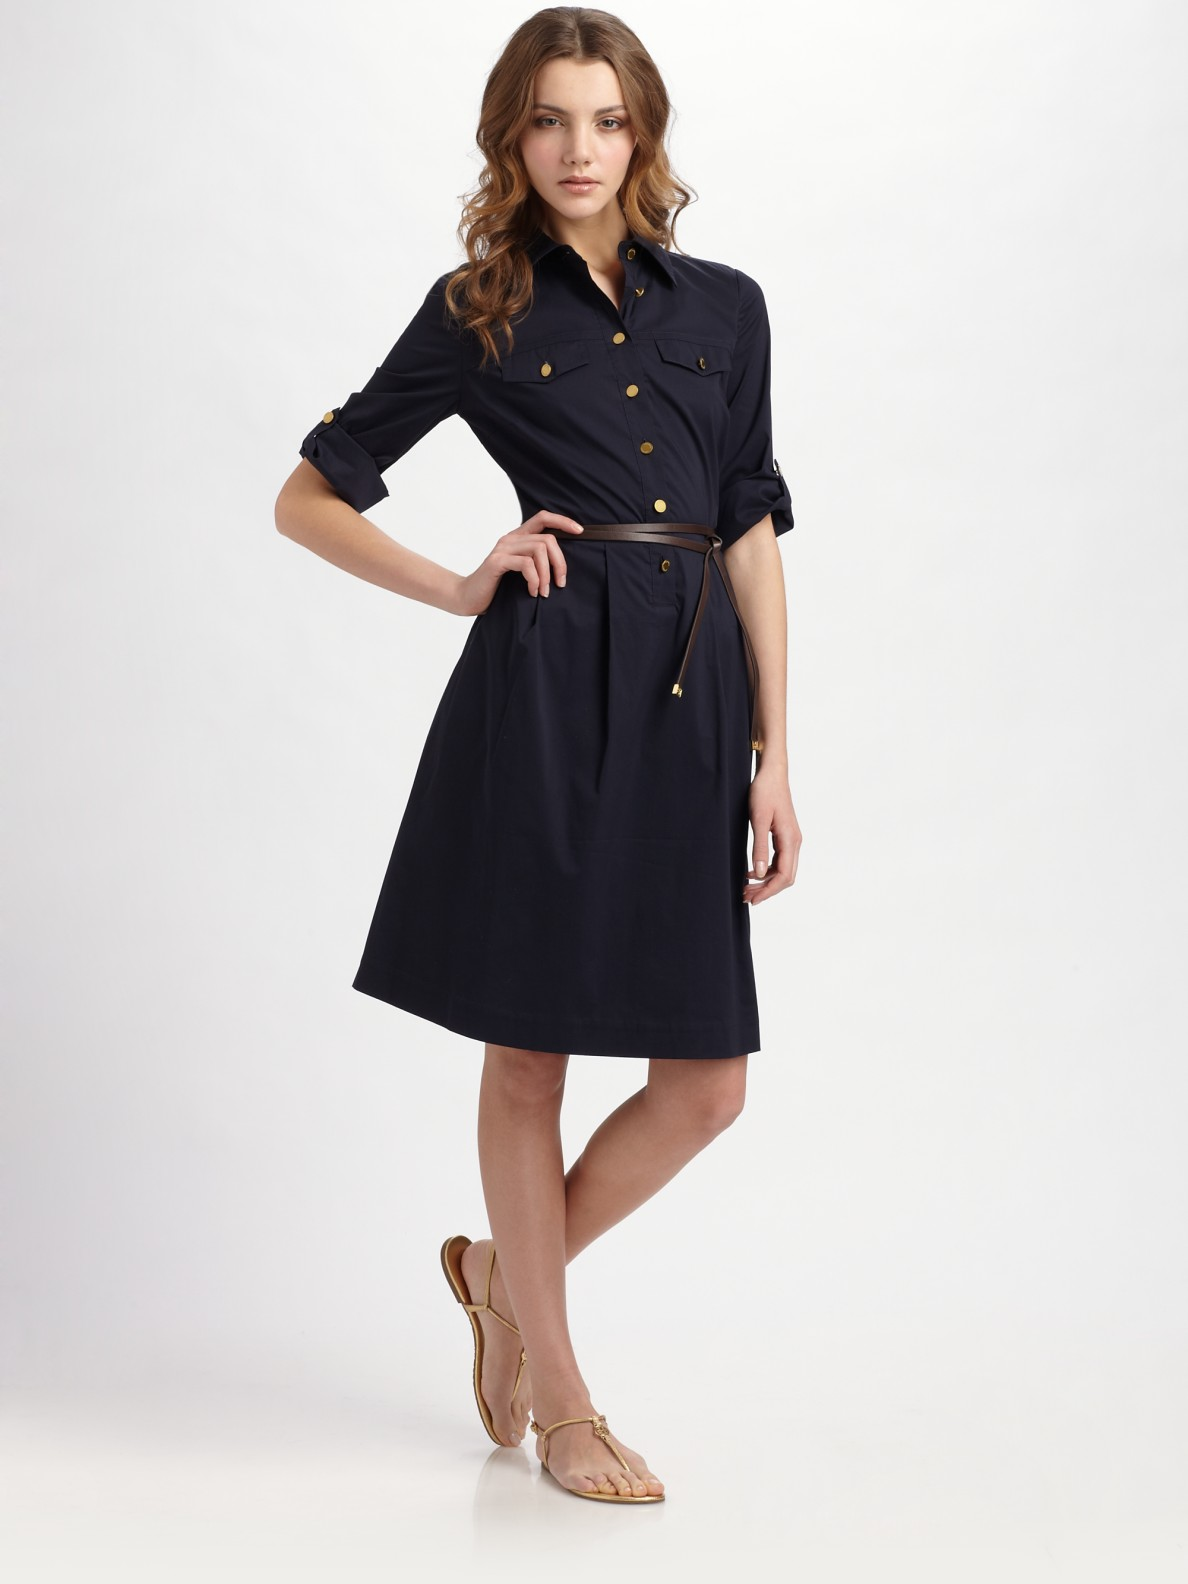 Tory Burch Blythe Stretch Poplin Shirt Dress In Blue Lyst